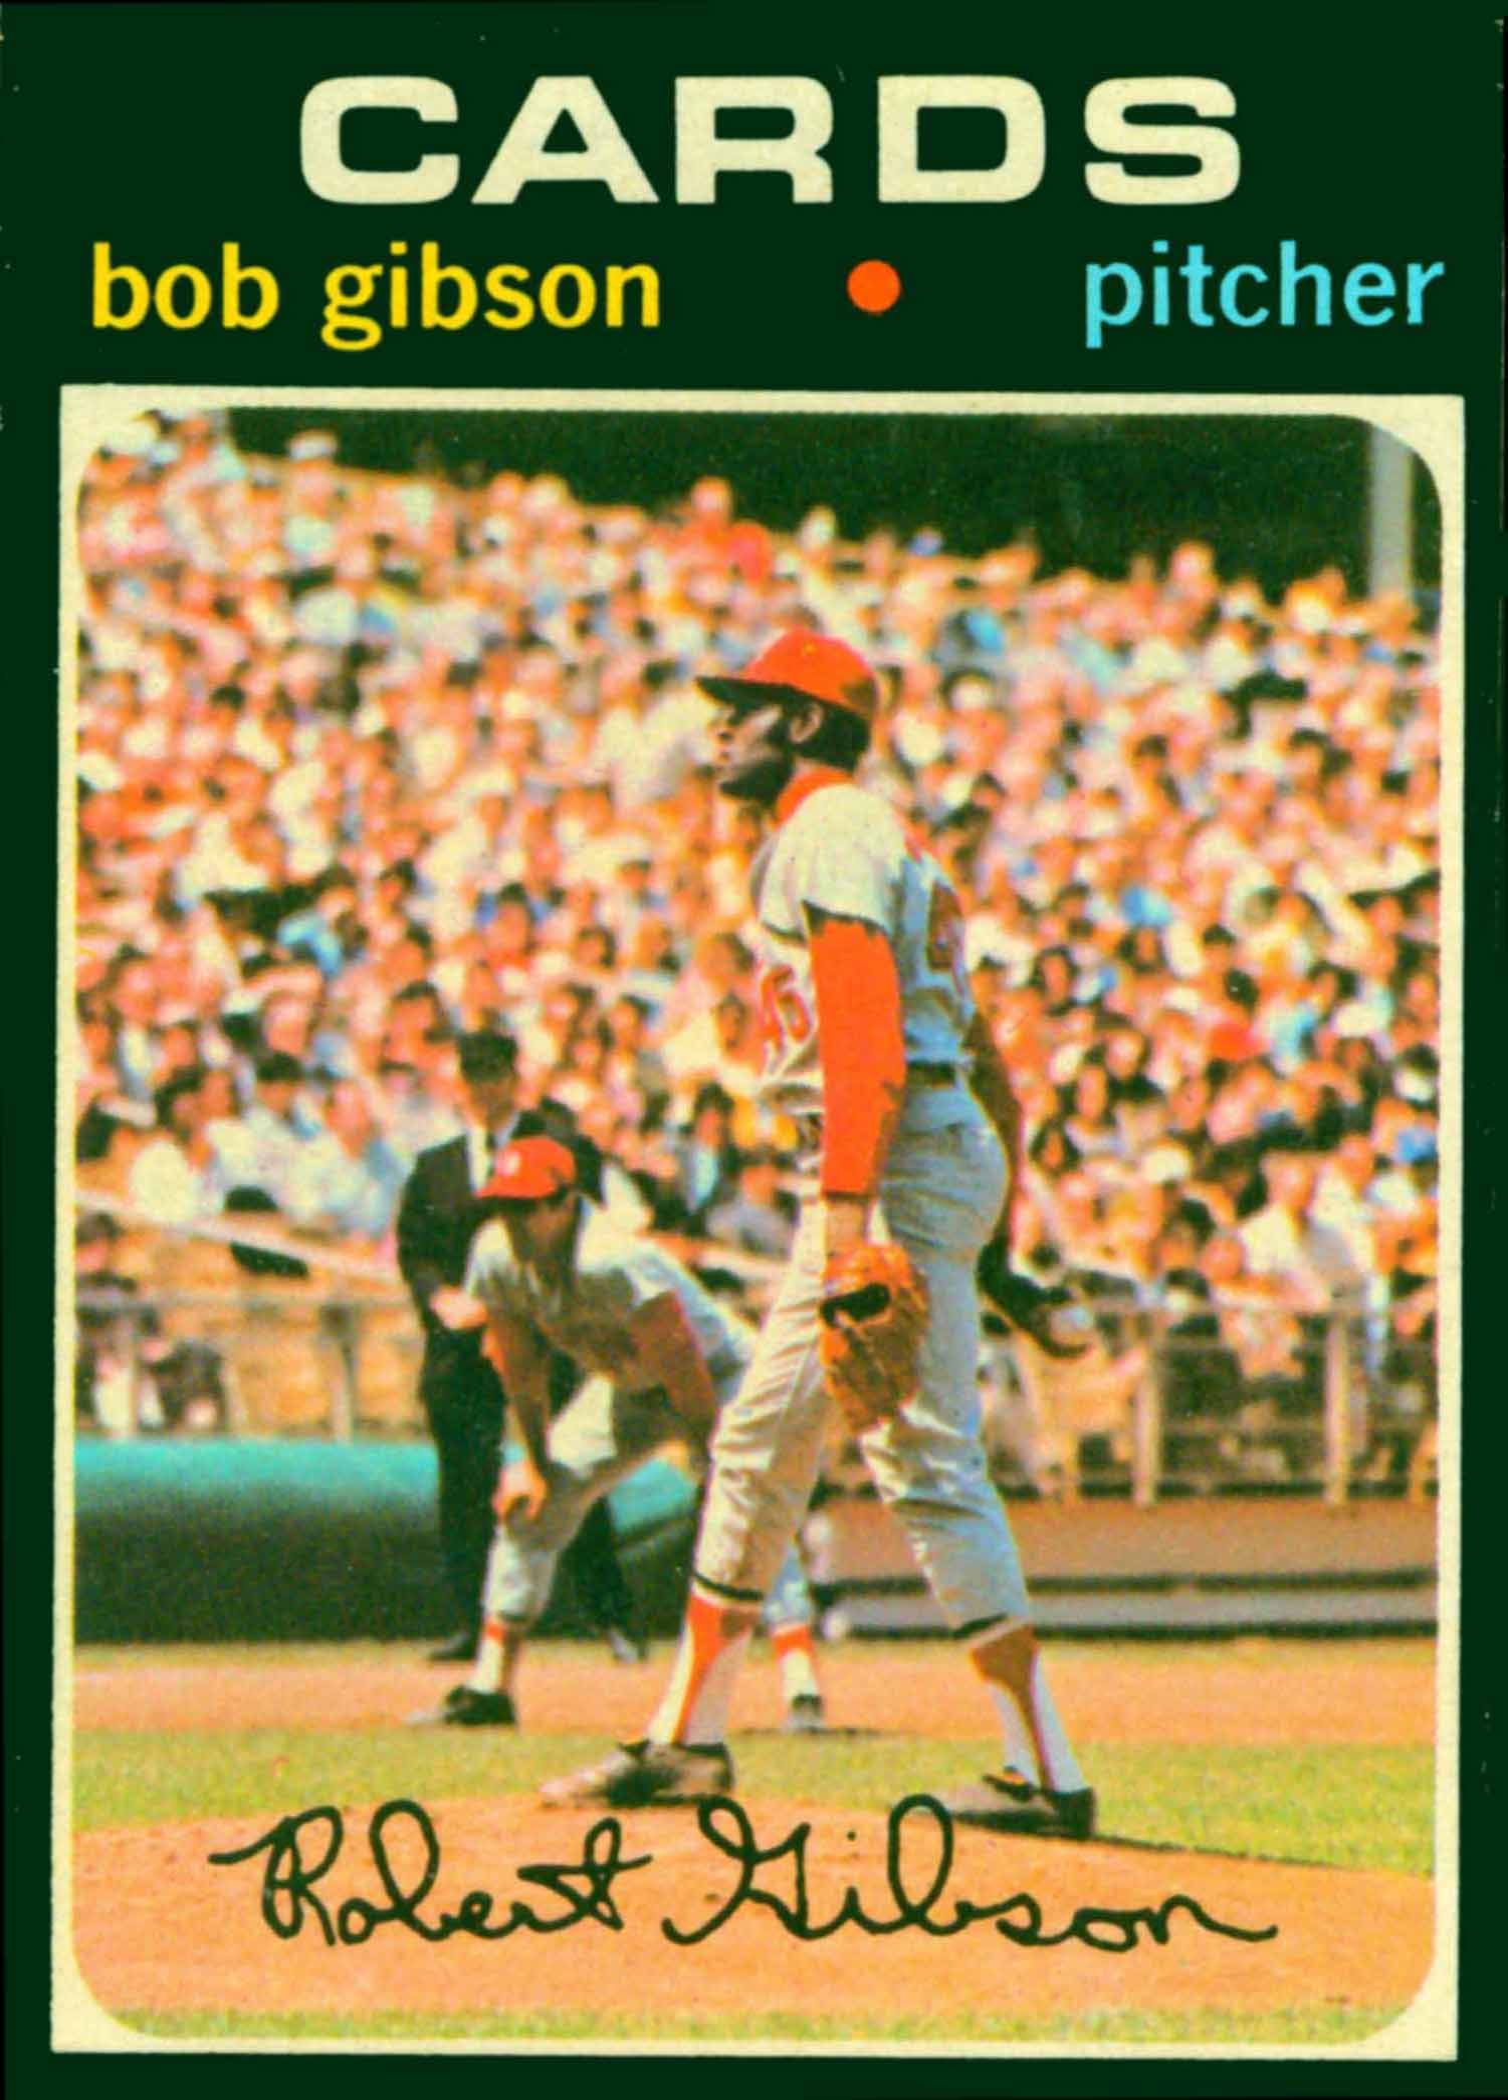 1970 Cards Topps Baseball Cardinals